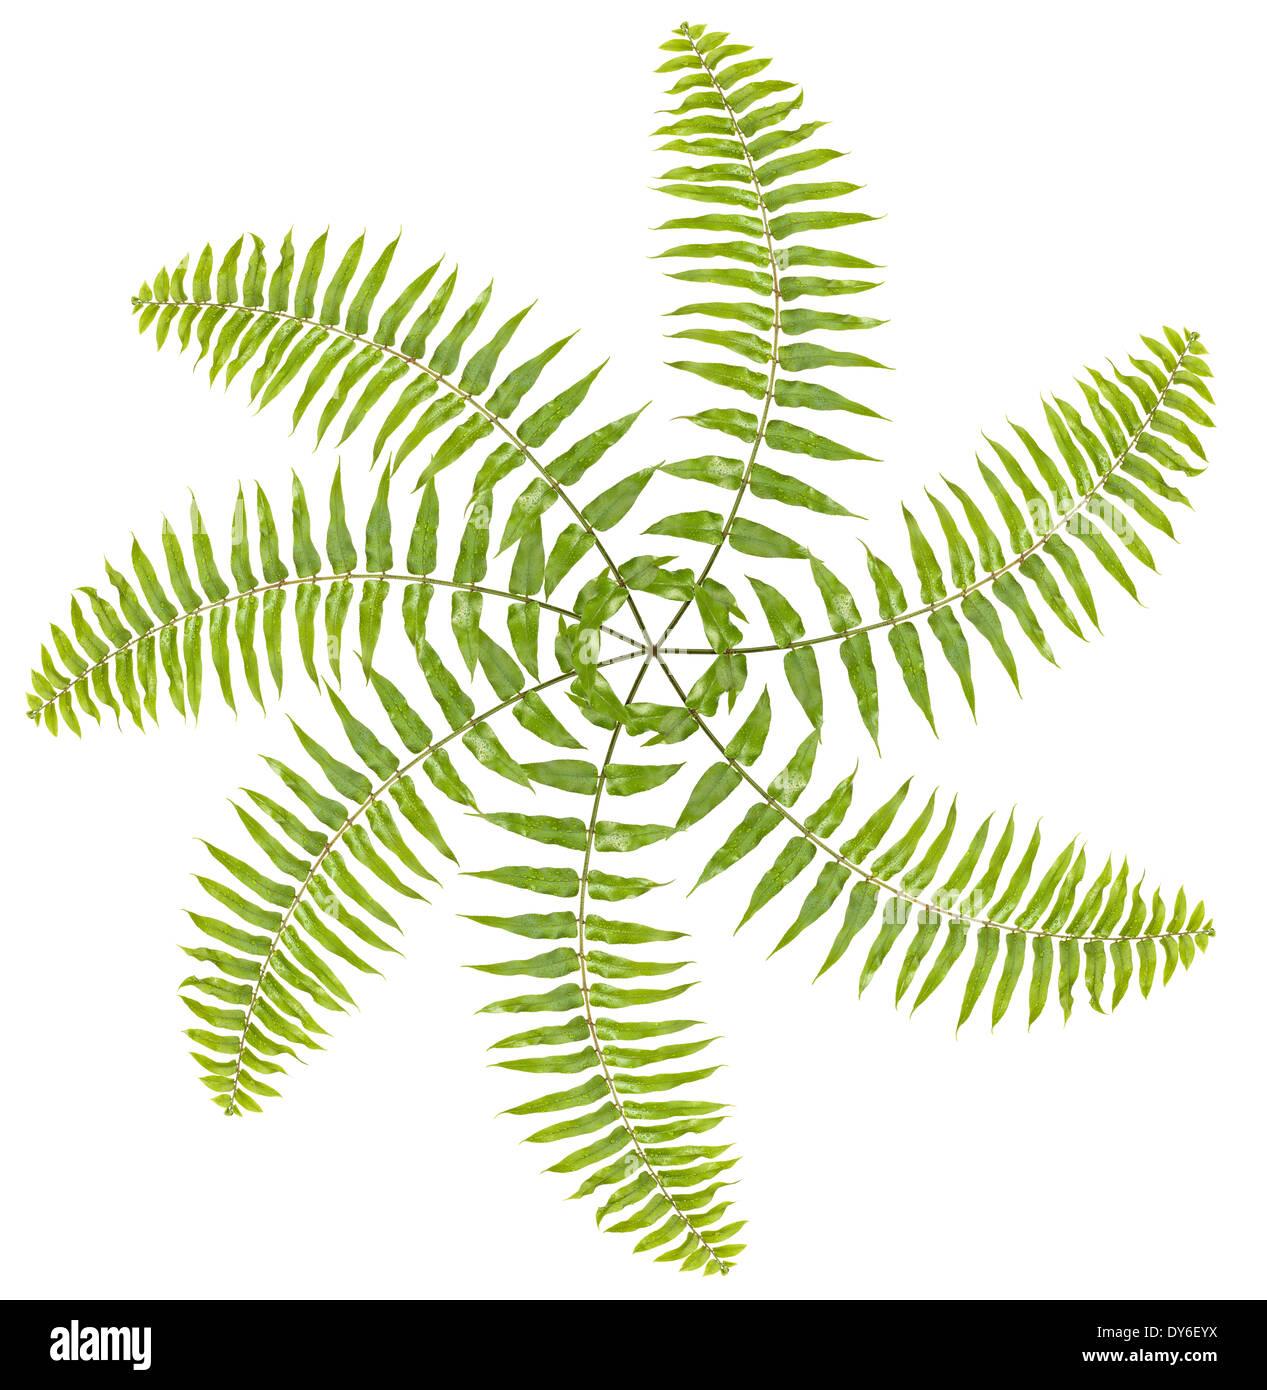 Propeller made of fern leaves on white background. - Stock Image